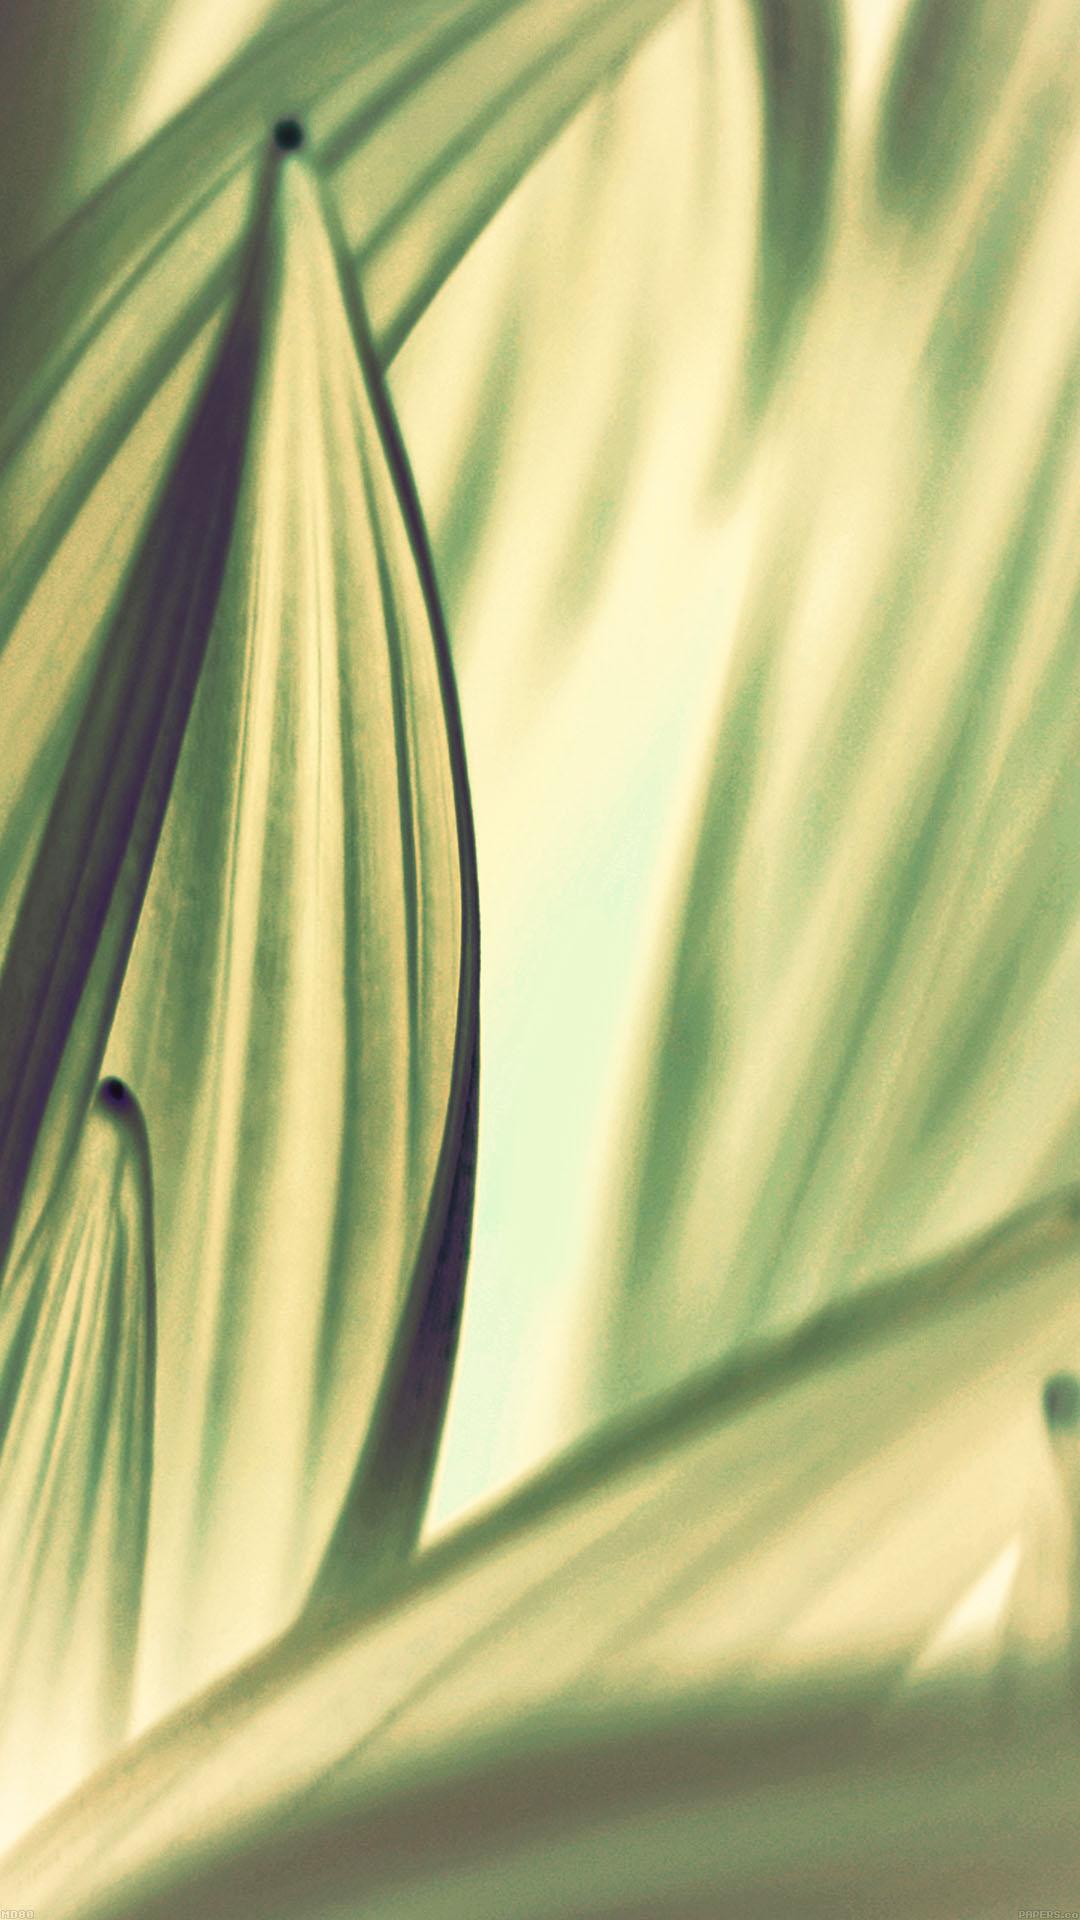 Leaf Nature Light